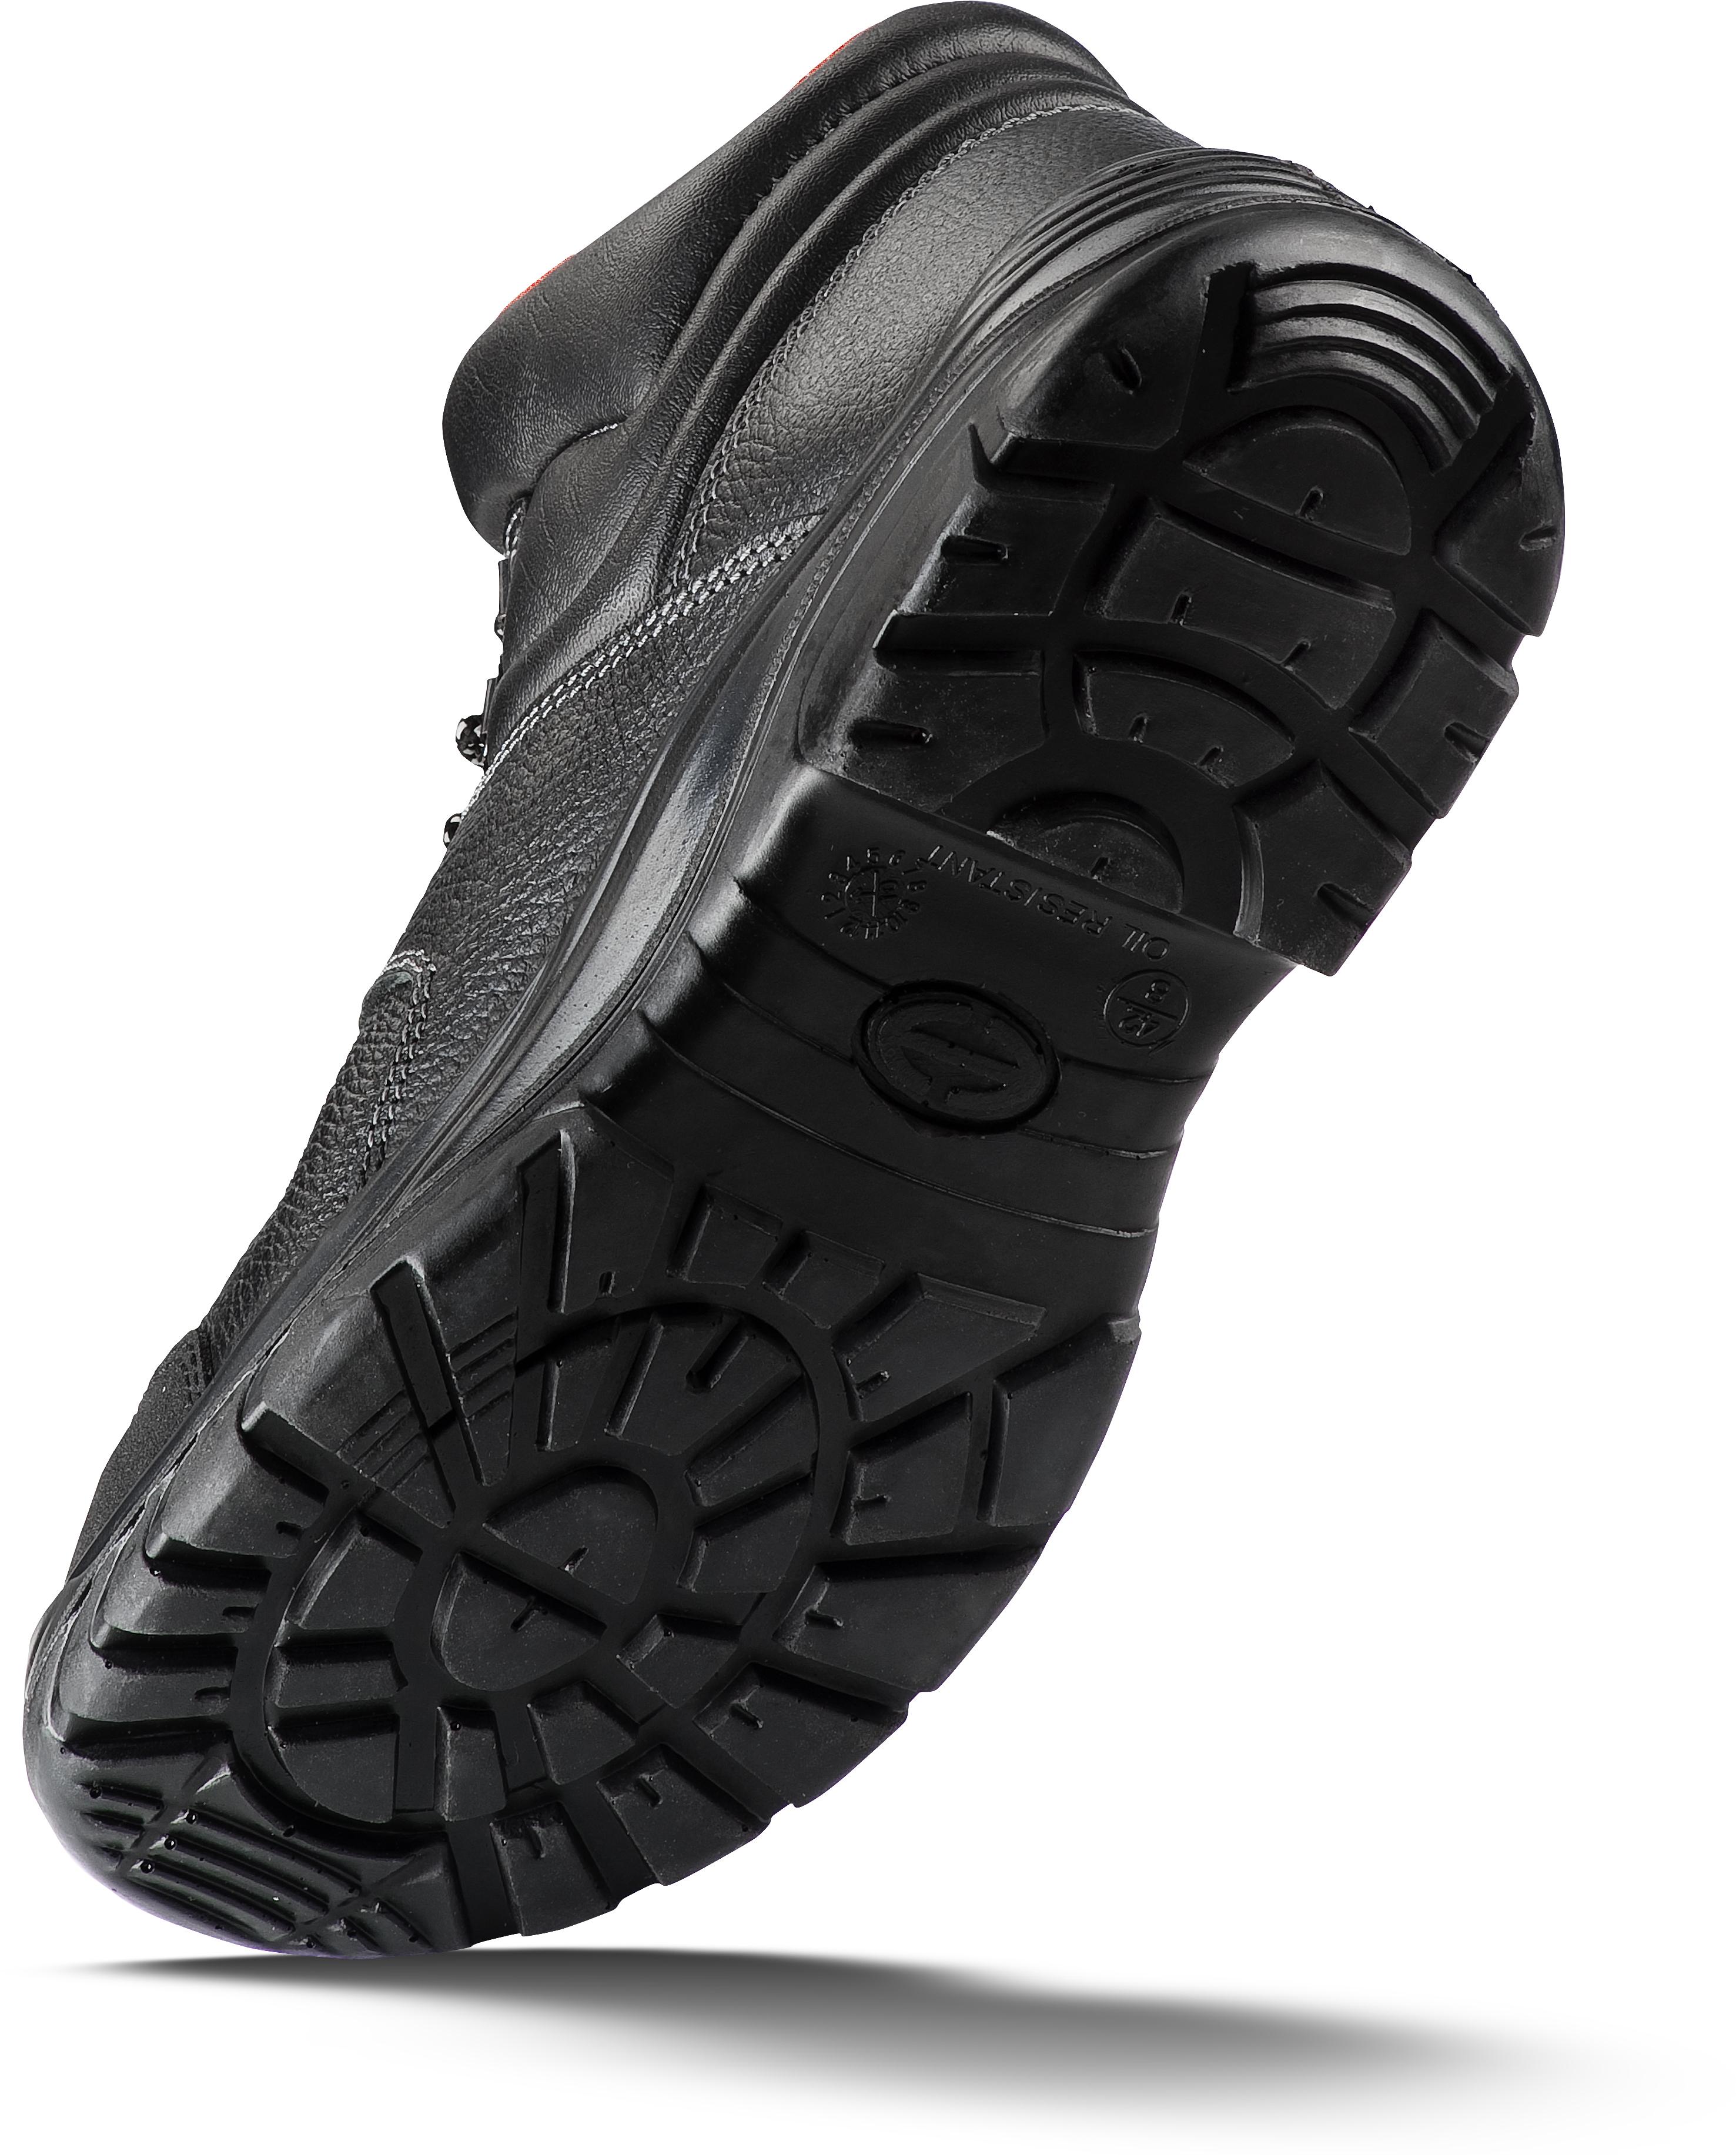 """Chaussure de sécurité S3 haute FOCUS high -  semelle PU2D"""